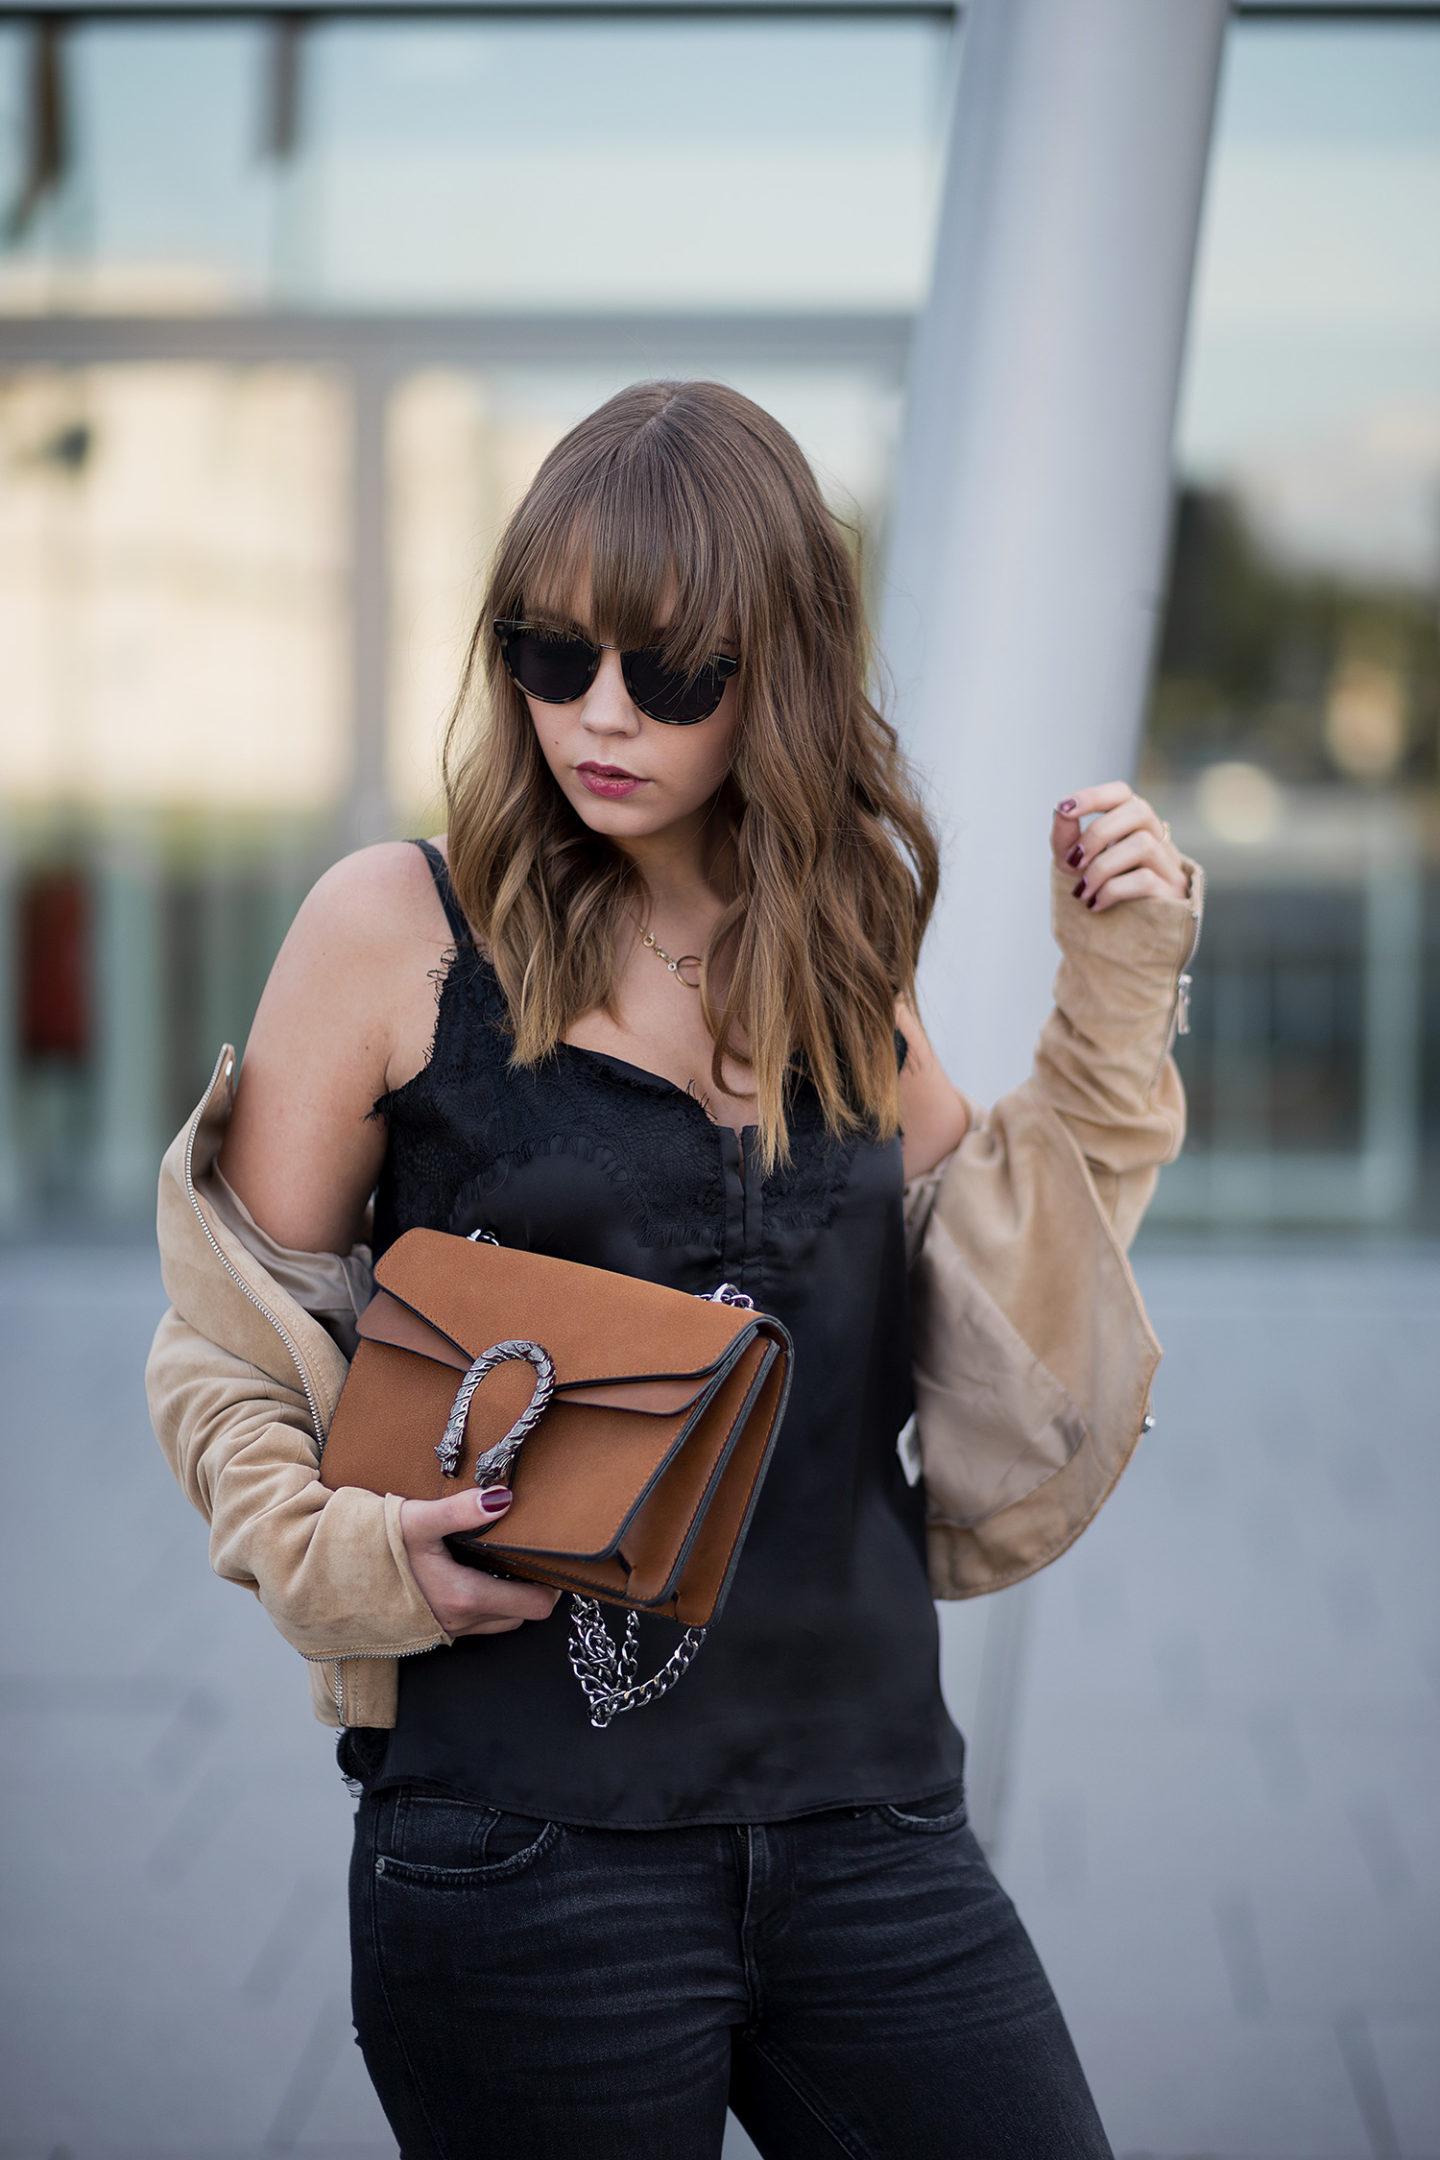 schwarz-und-braun-kombinieren-outfit-lingerie-top-wildlederjacke-adidas-superstars-gucci-dionysus-lookalike-streetstyle-bezauberndenana-3